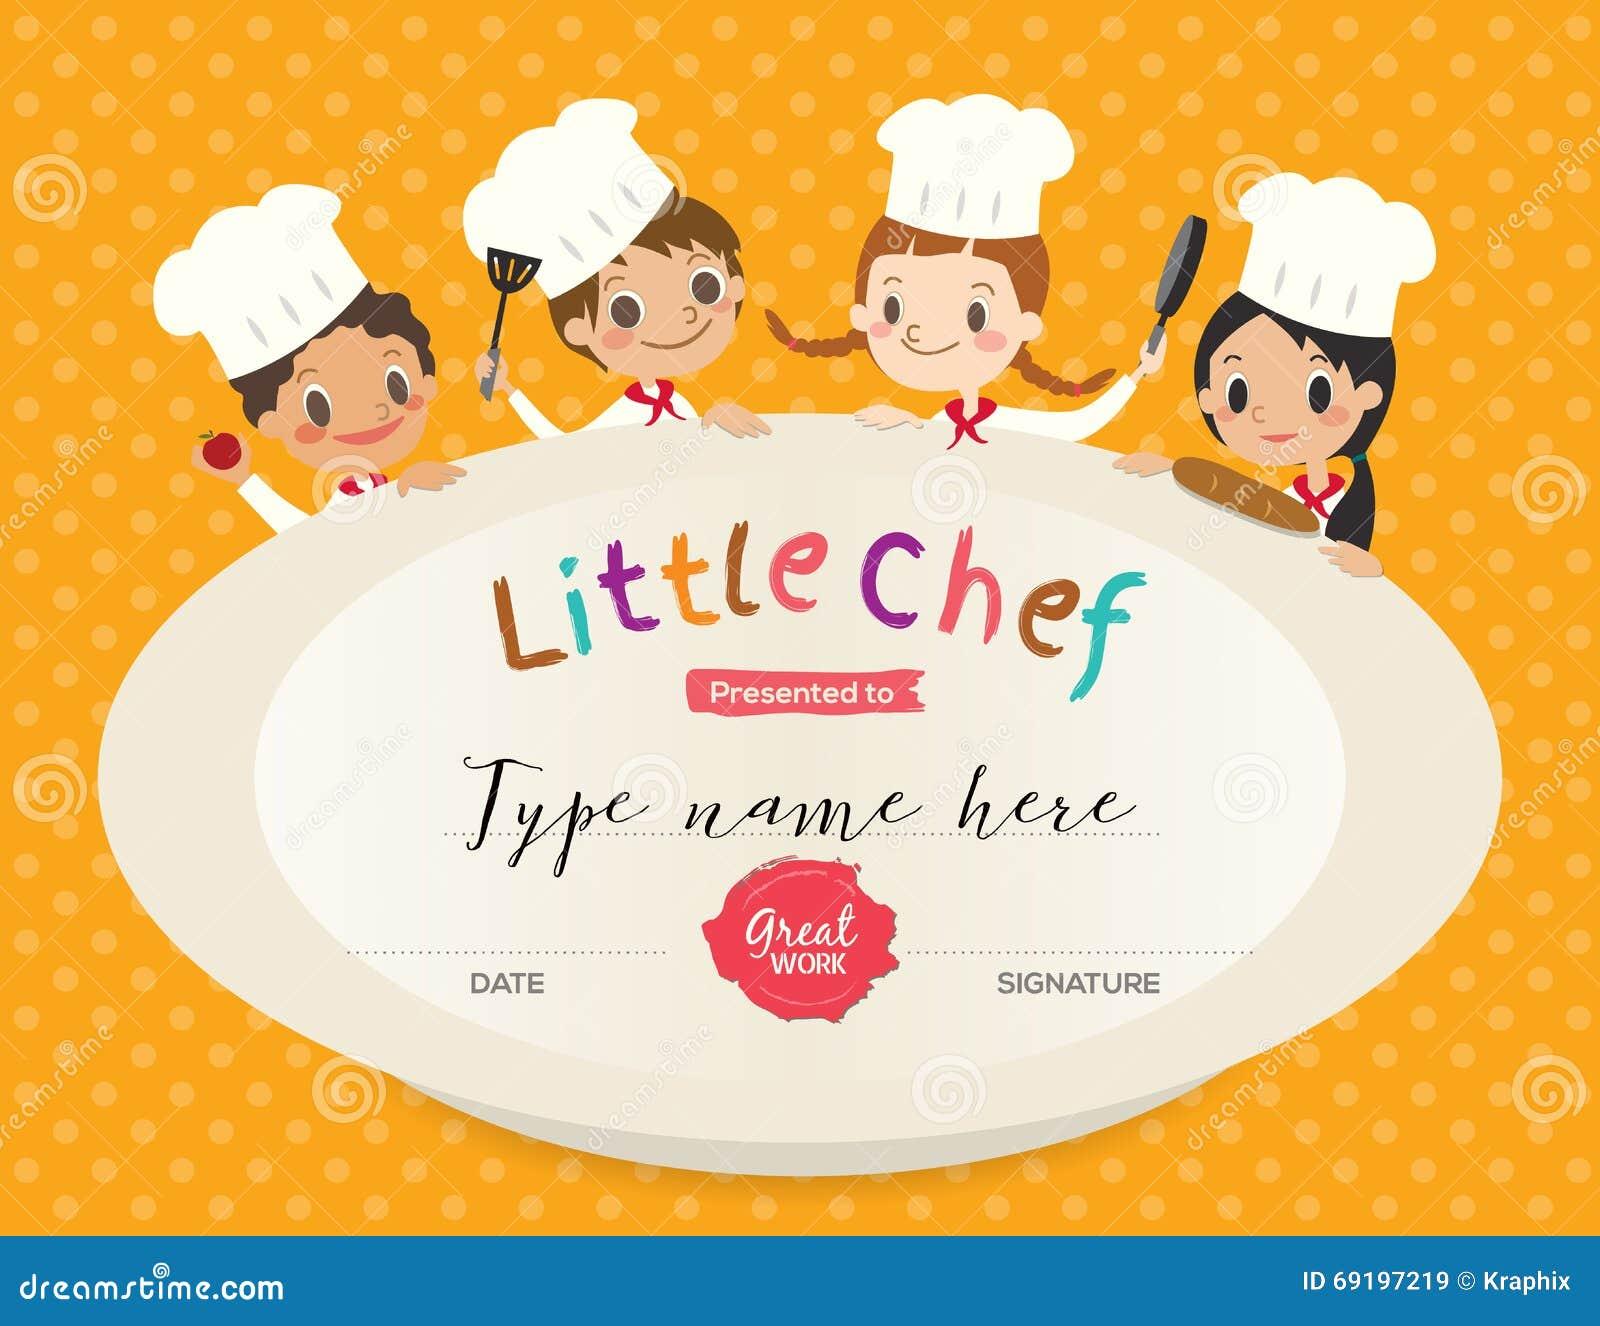 cooking certificate template – Certificate Design Format